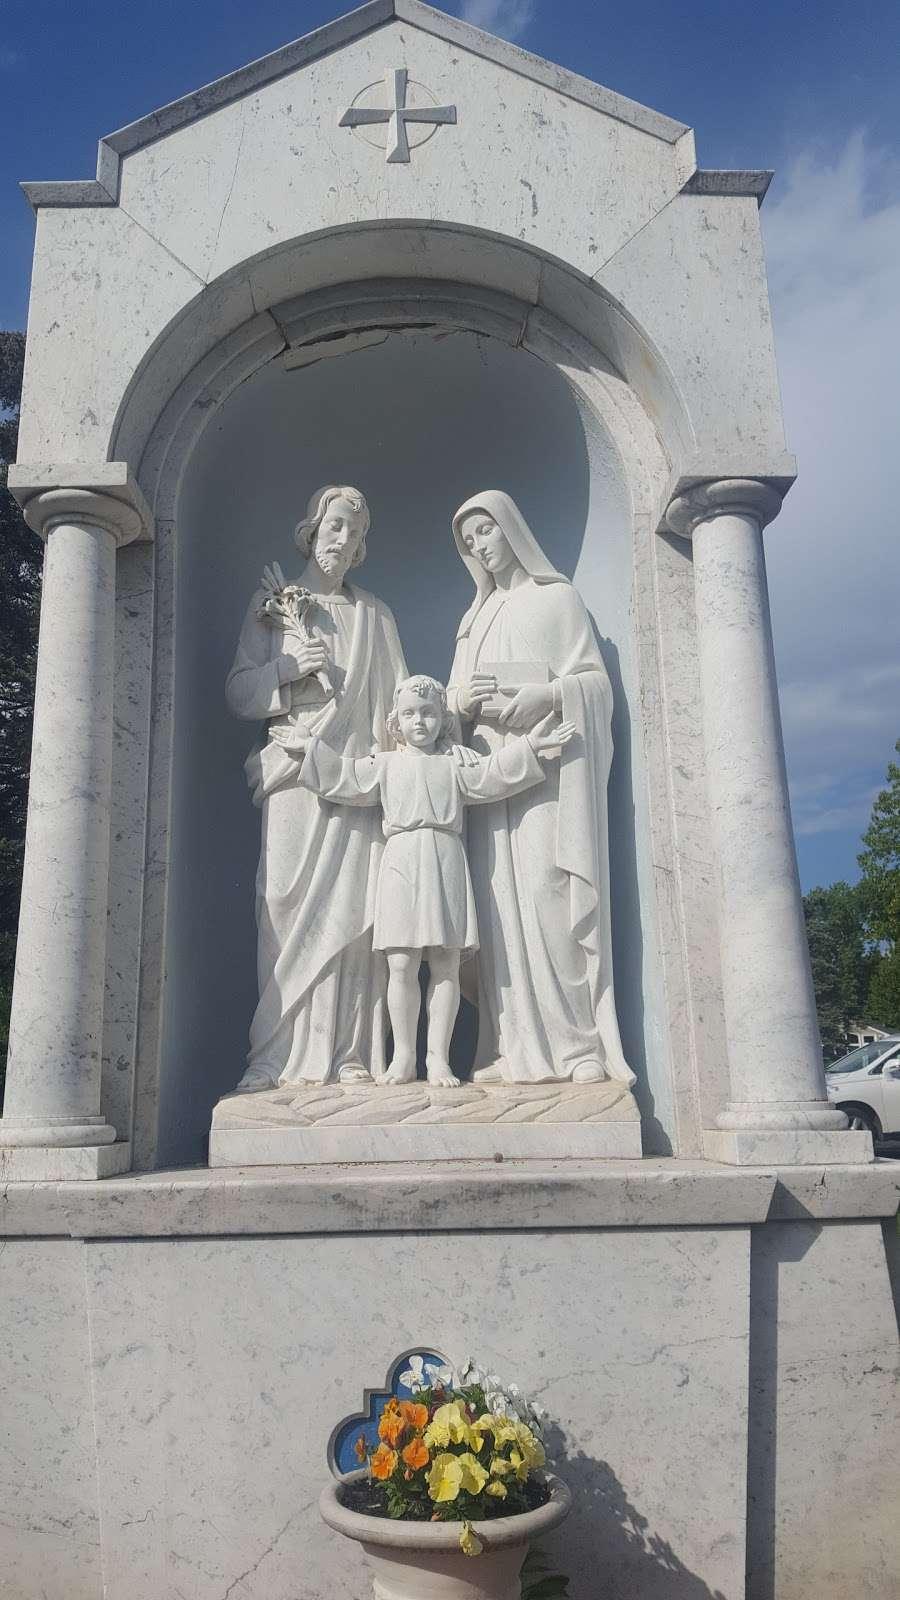 Saint Alphonsus Catholic Church - church  | Photo 2 of 10 | Address: 33 Conwell Dr, Maple Glen, PA 19002, USA | Phone: (215) 646-4600